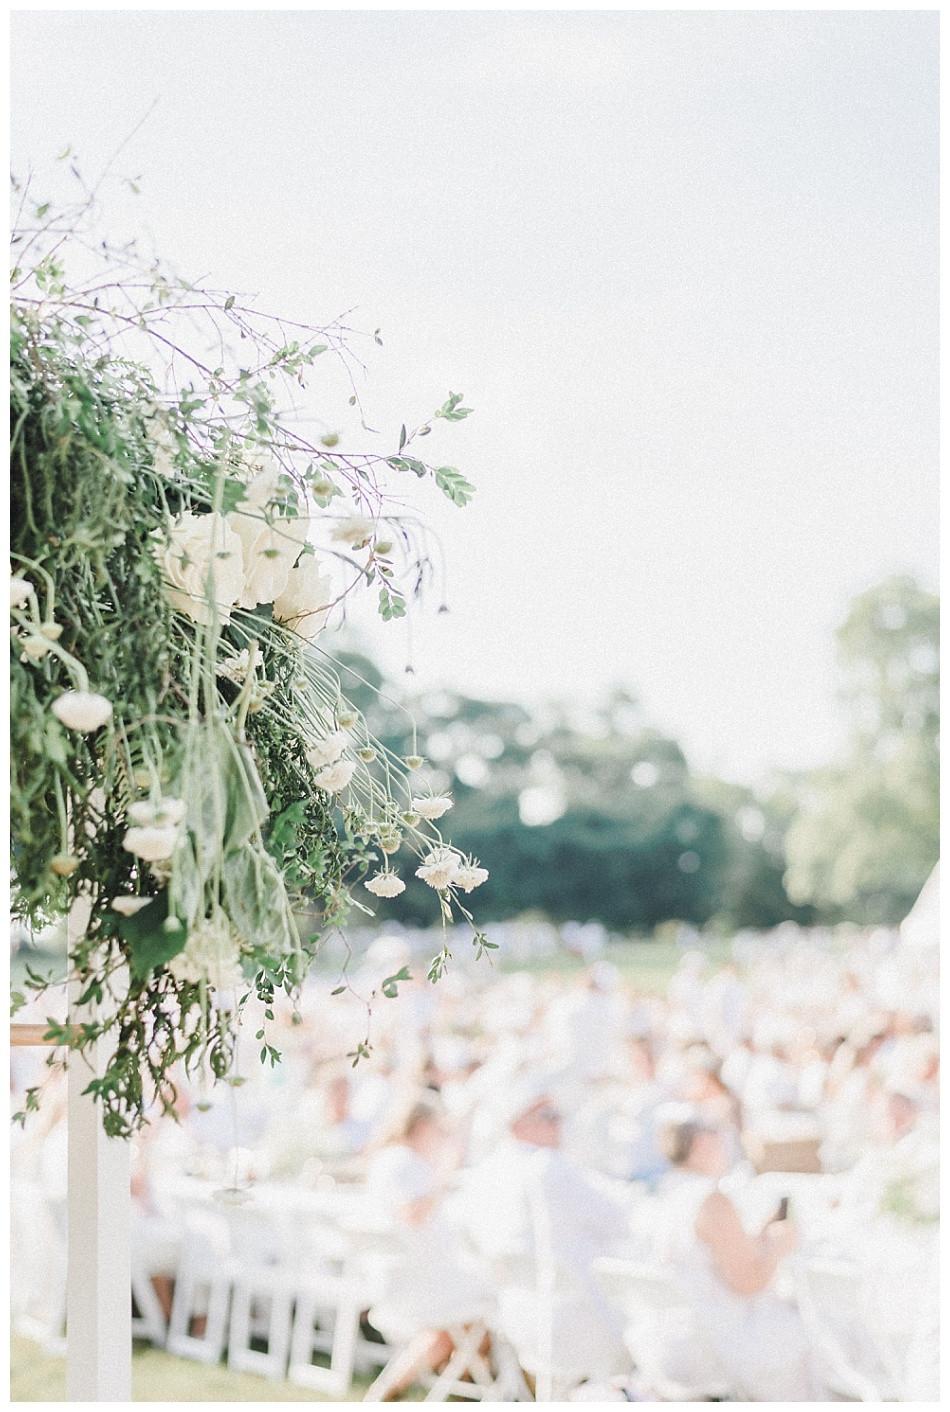 Floral Design at Fete en Blanc Lancaster 2019 at Longs Park by Angela Weiler Photography.